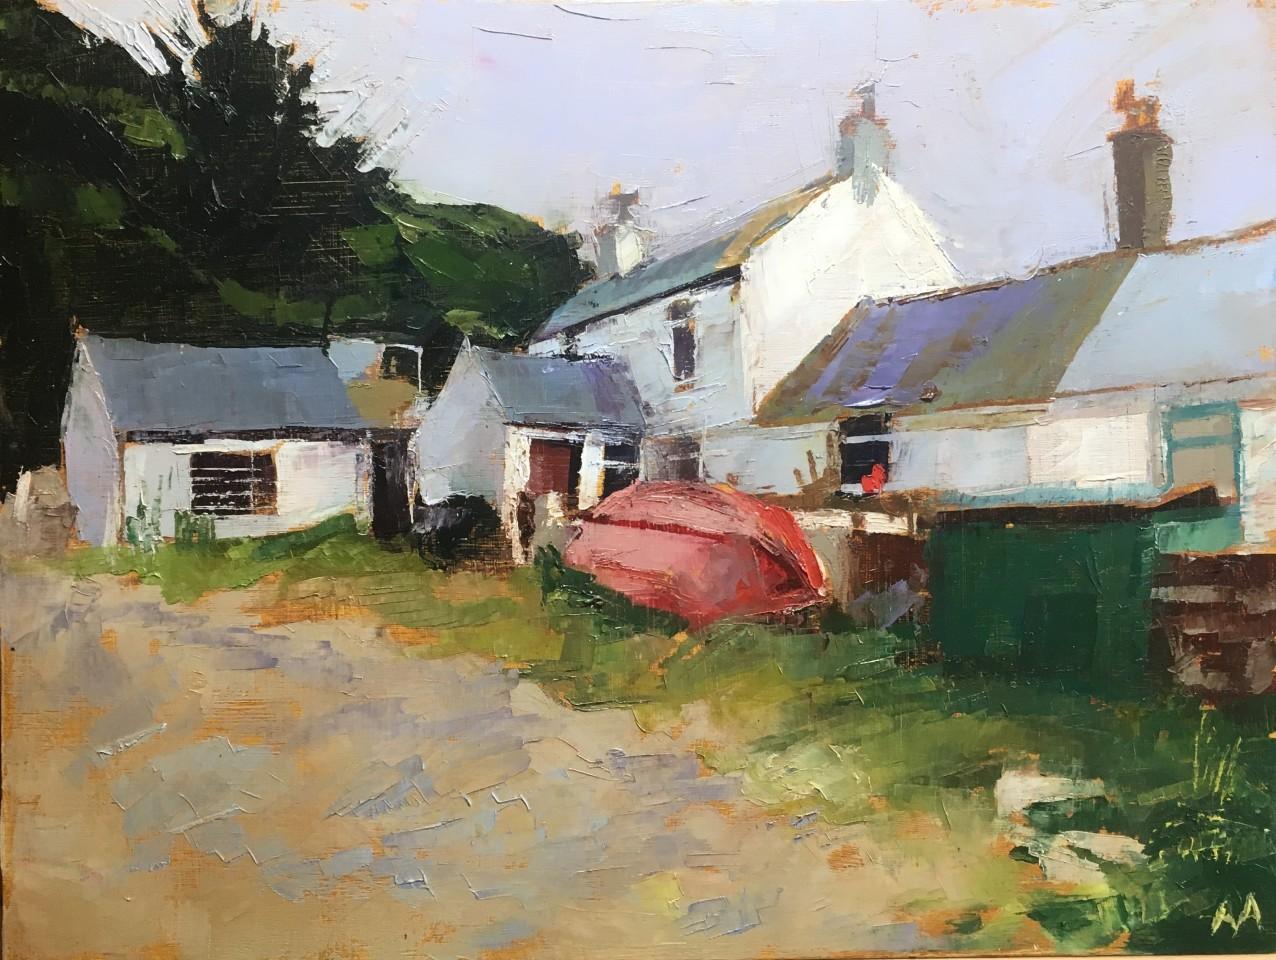 Anne Aspinall, Red Boat, Porthdinllaen